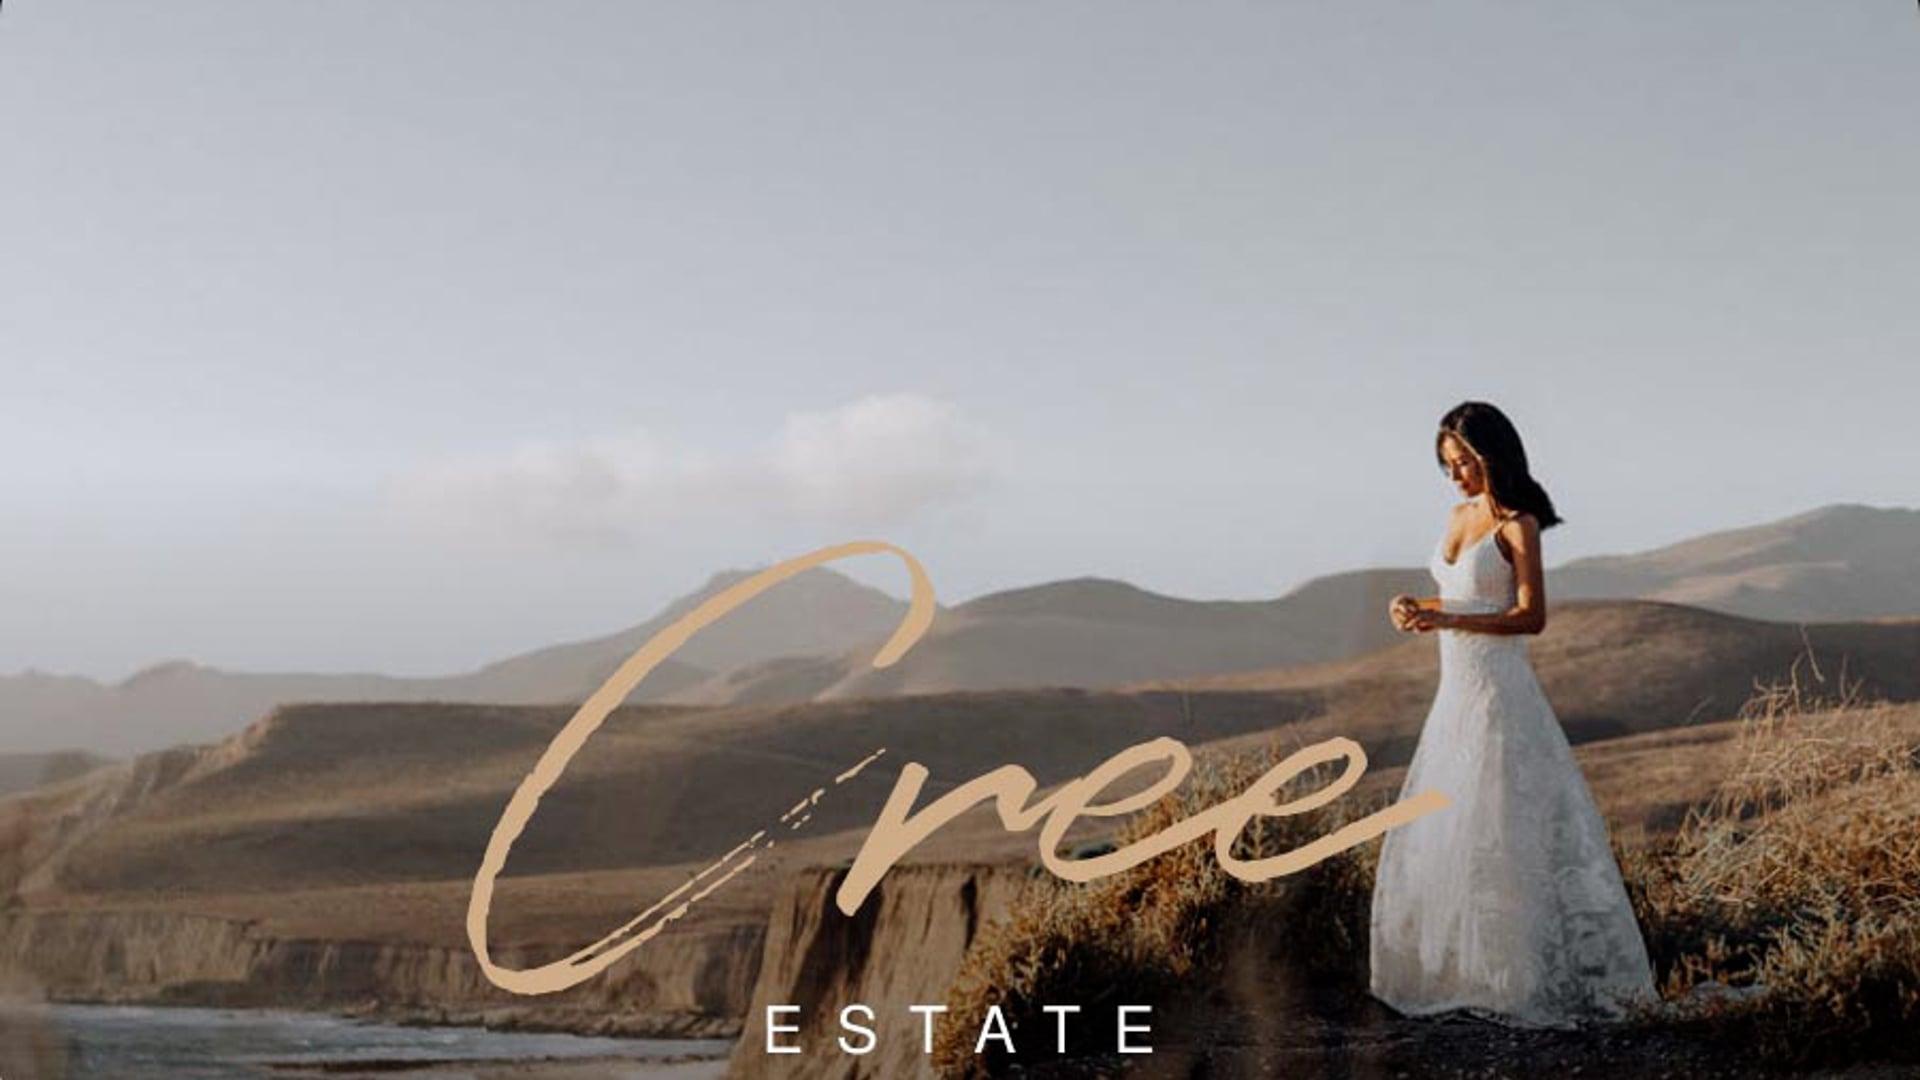 Wedding Video at Cree Estate, Palm Springs | Samantha + Ando